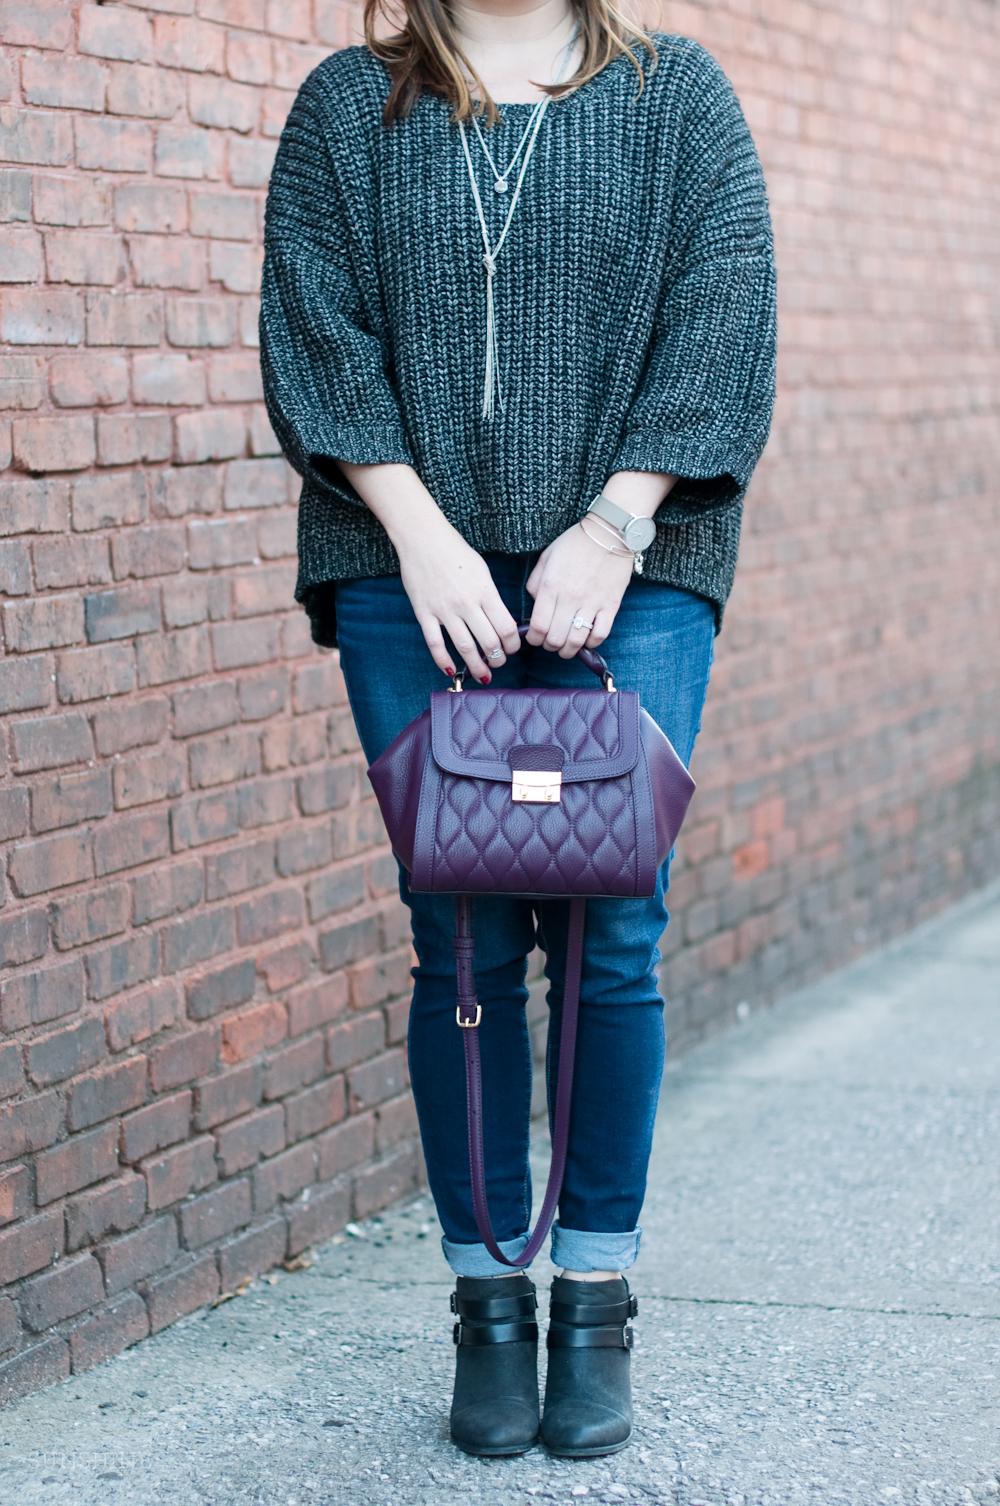 Vera Bradley Mini Satchel, Victoria's Secret Sweater